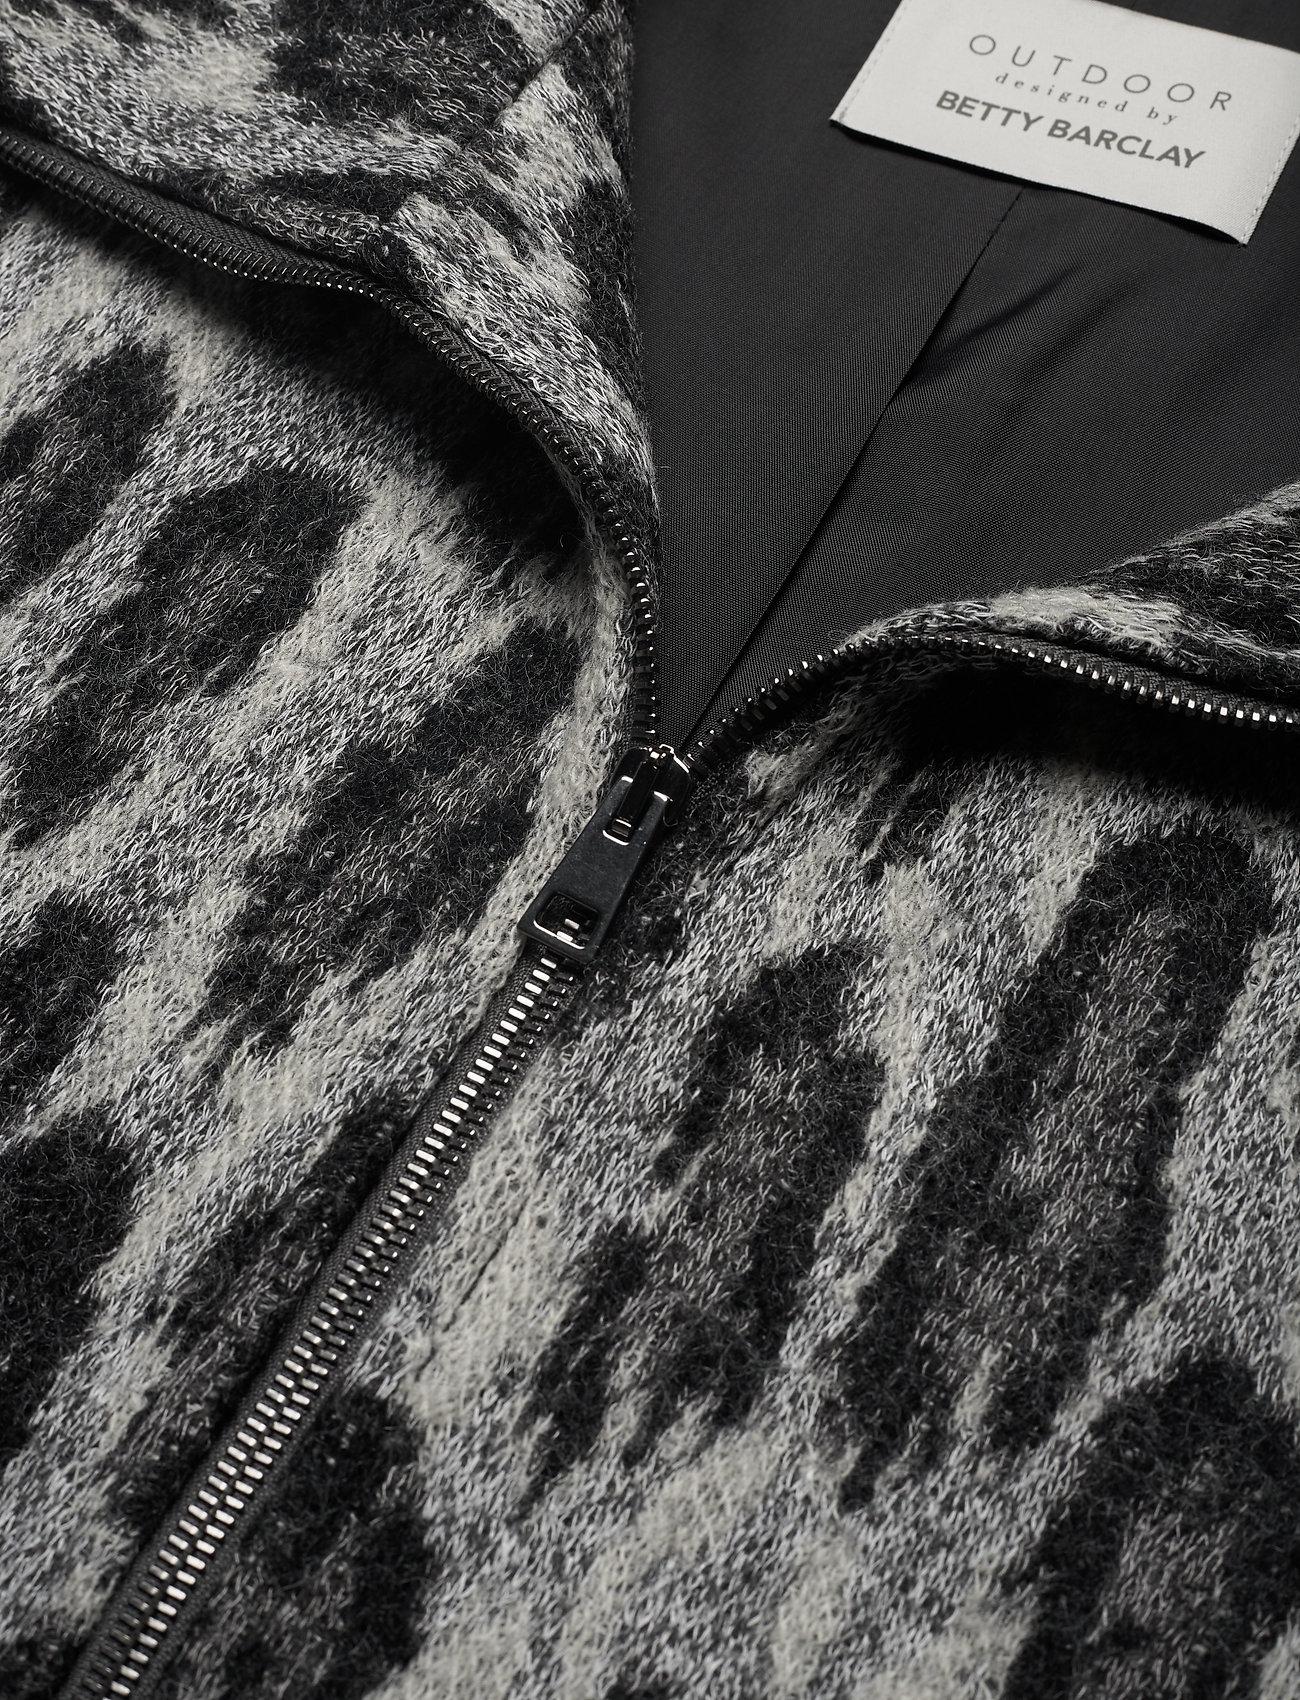 Jacket Wool (Cream/black) (1459.60 kr) - Betty Barclay